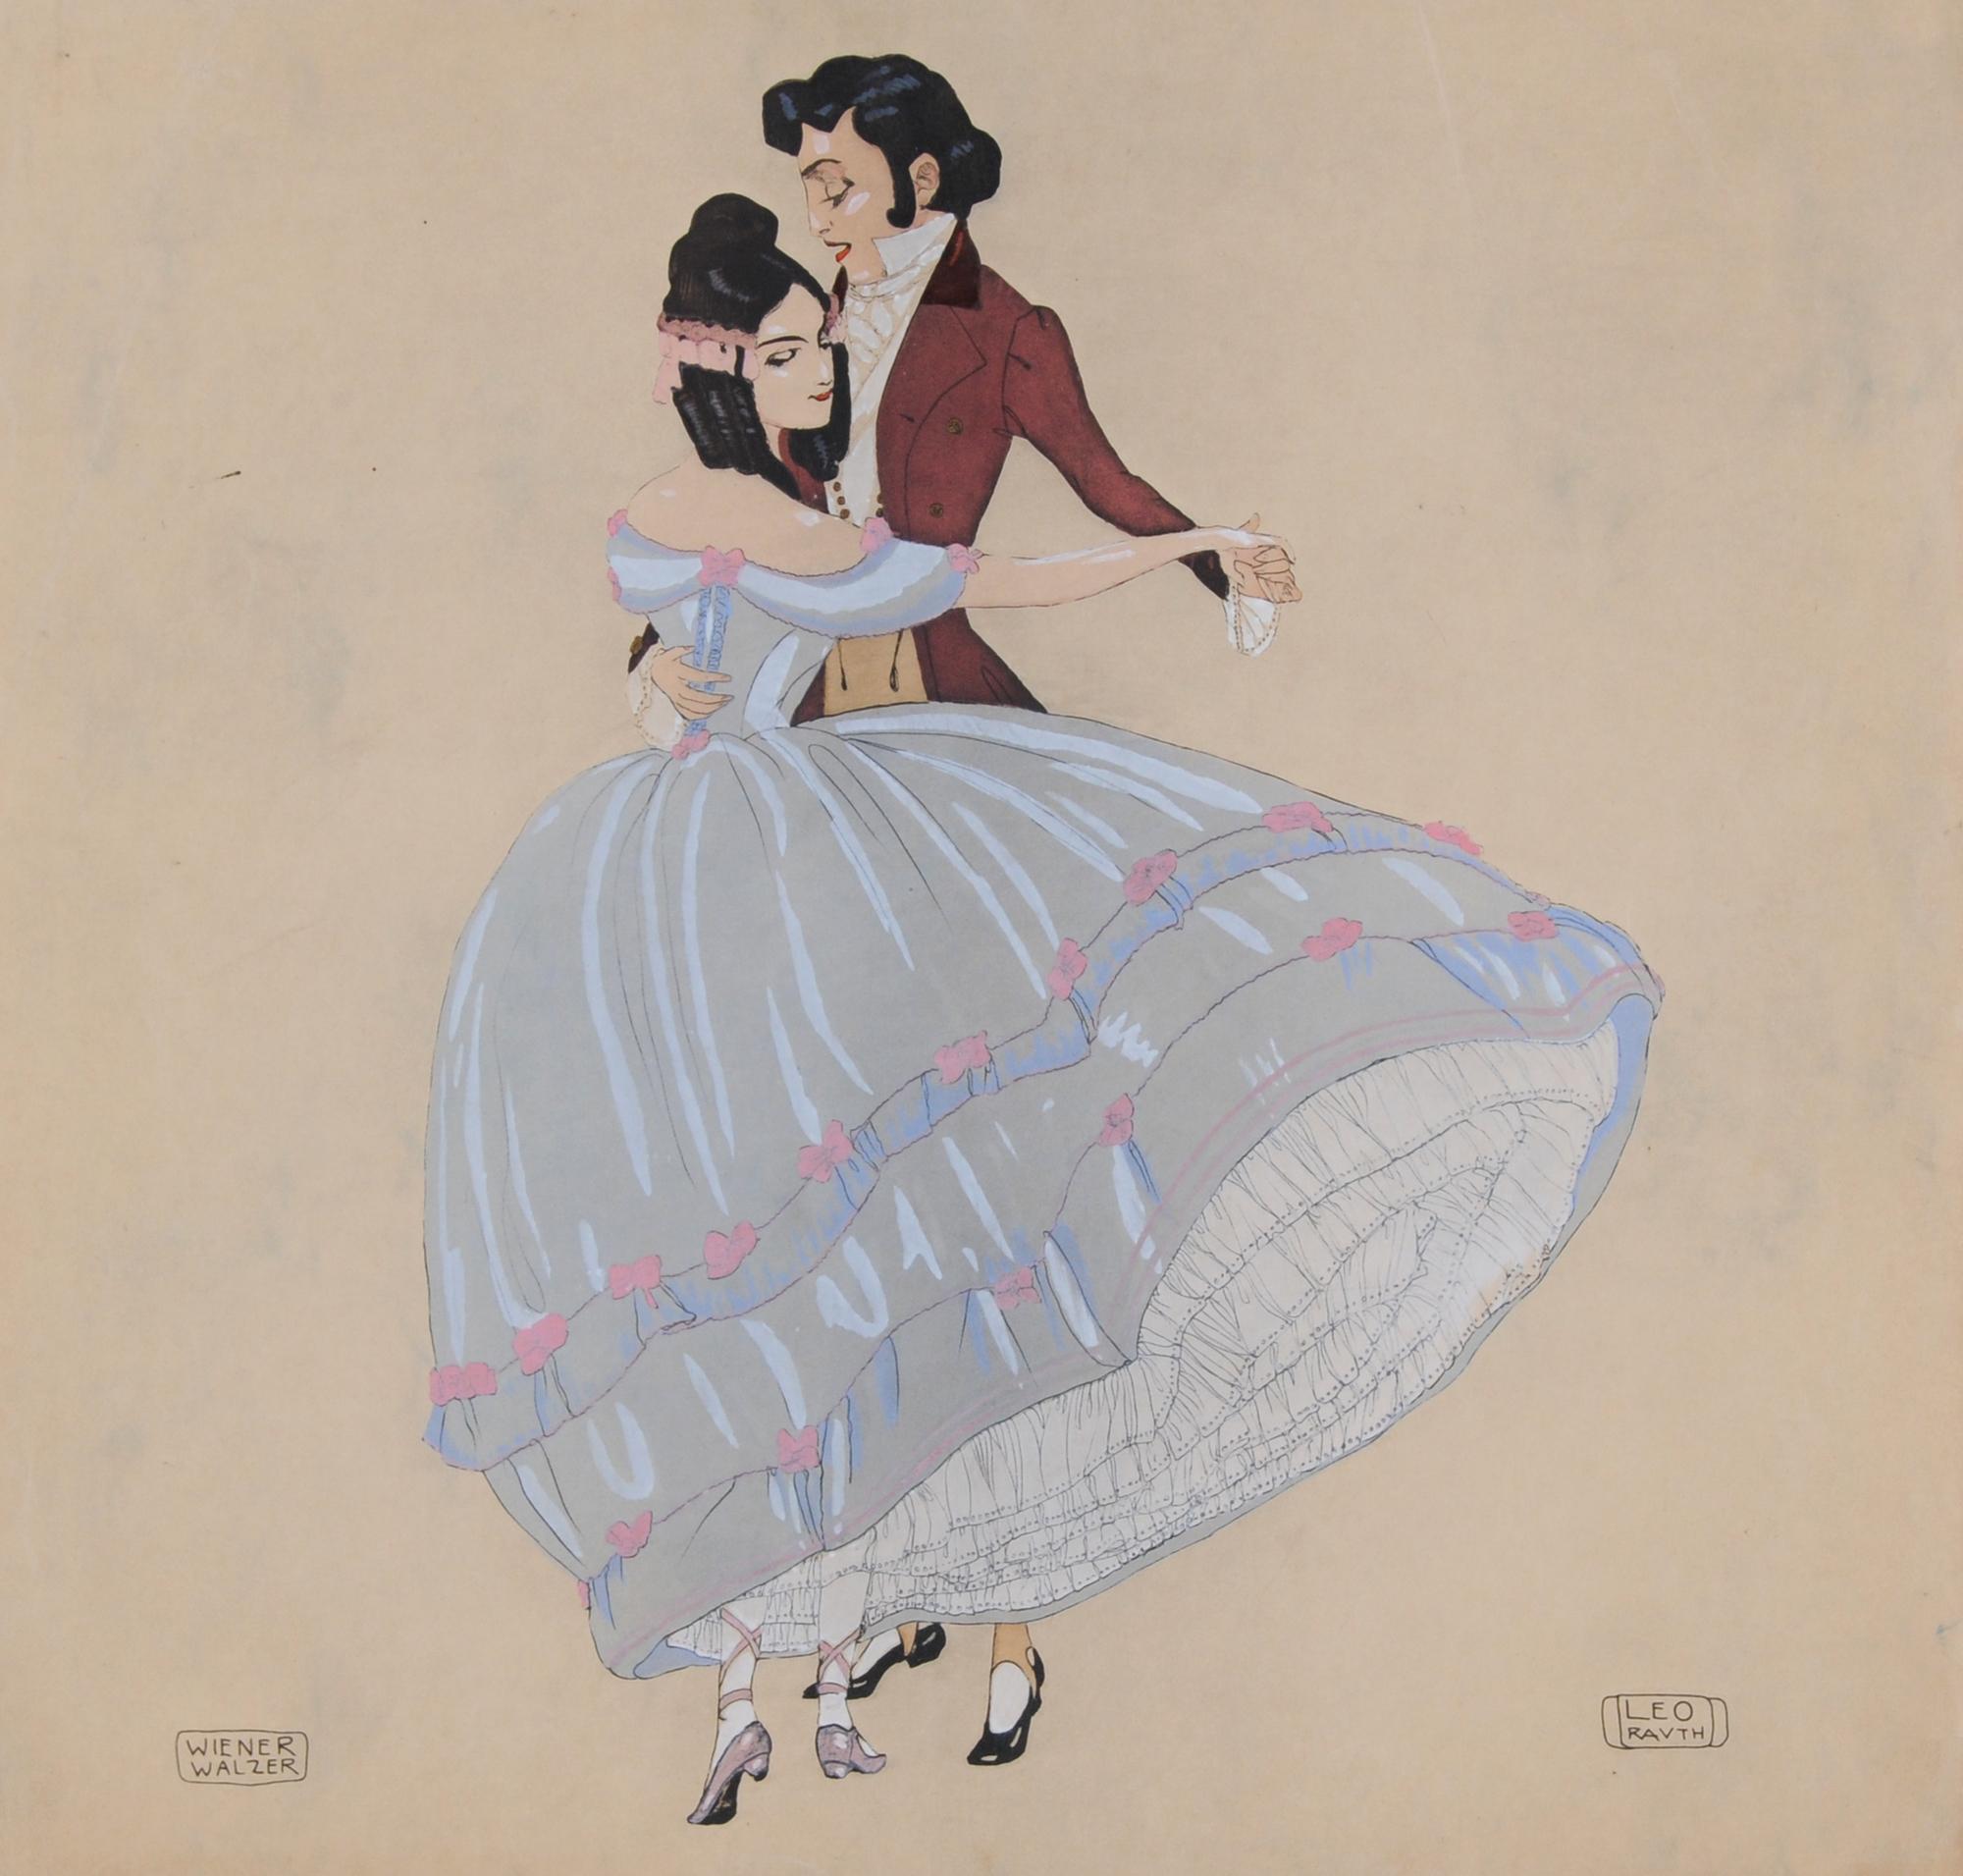 Rauth Leo, 4 sheets: Cake-Walk; Scherzo; Wiener Walzer; Fascination Valse